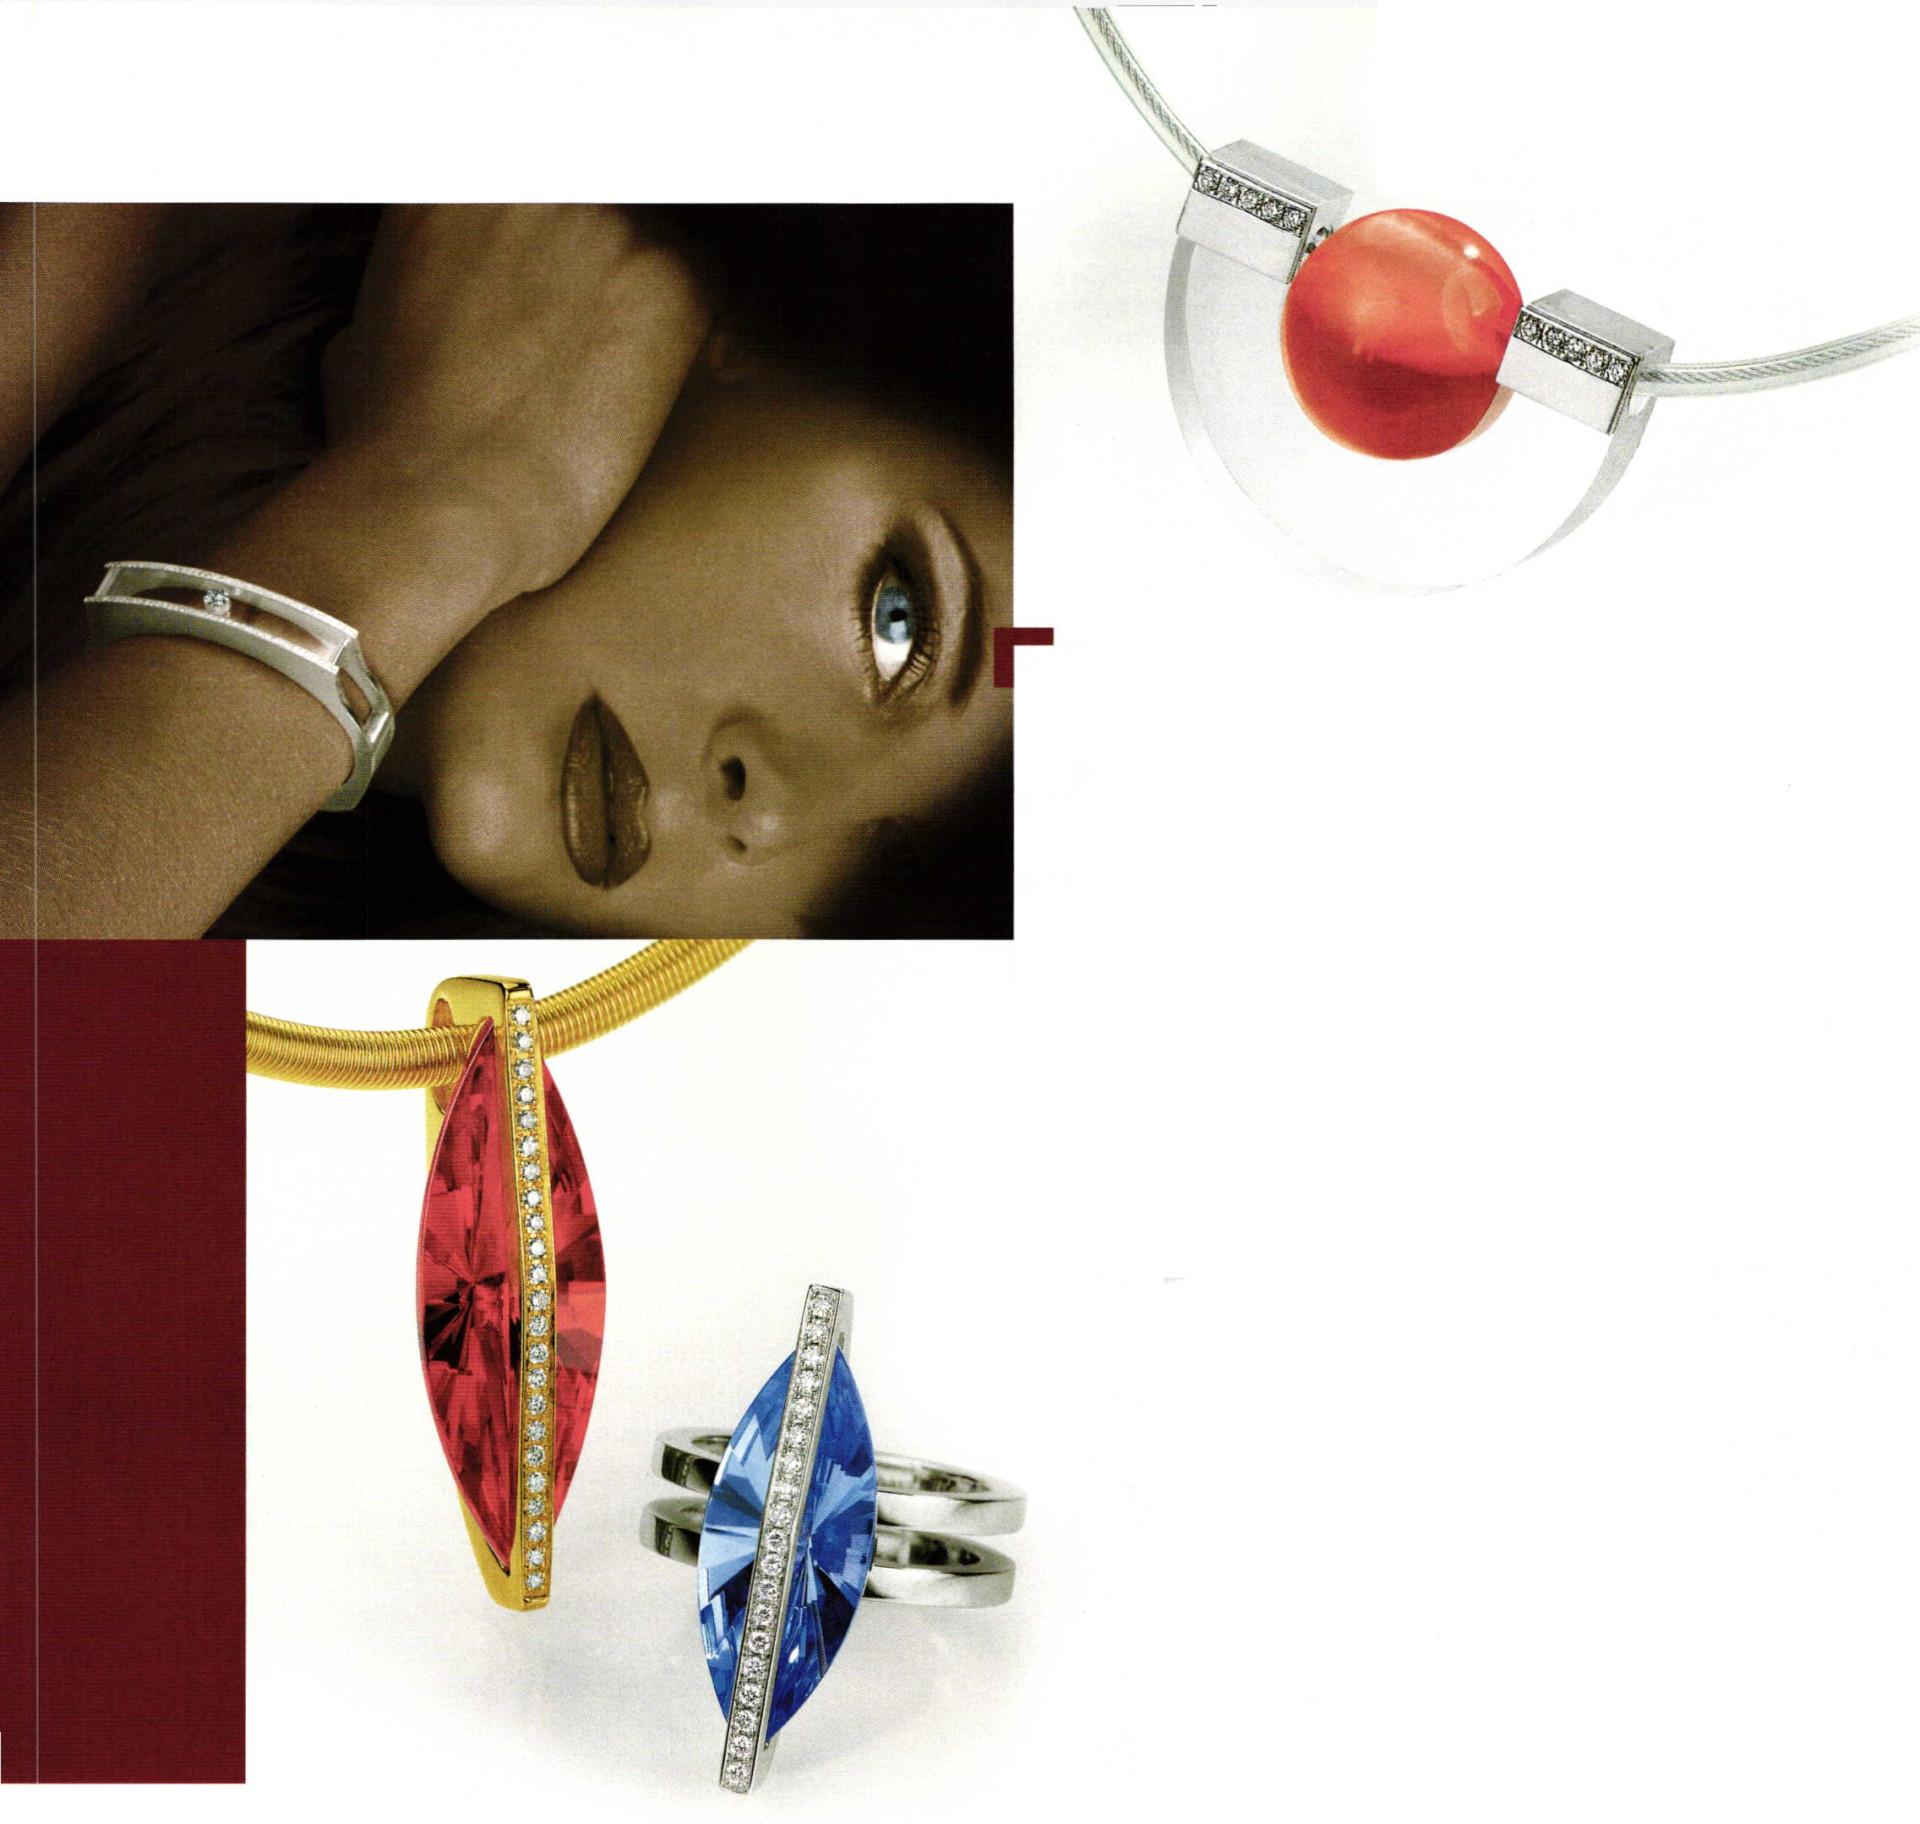 German Jewelry Quality and Creativity - Ganoksin Community